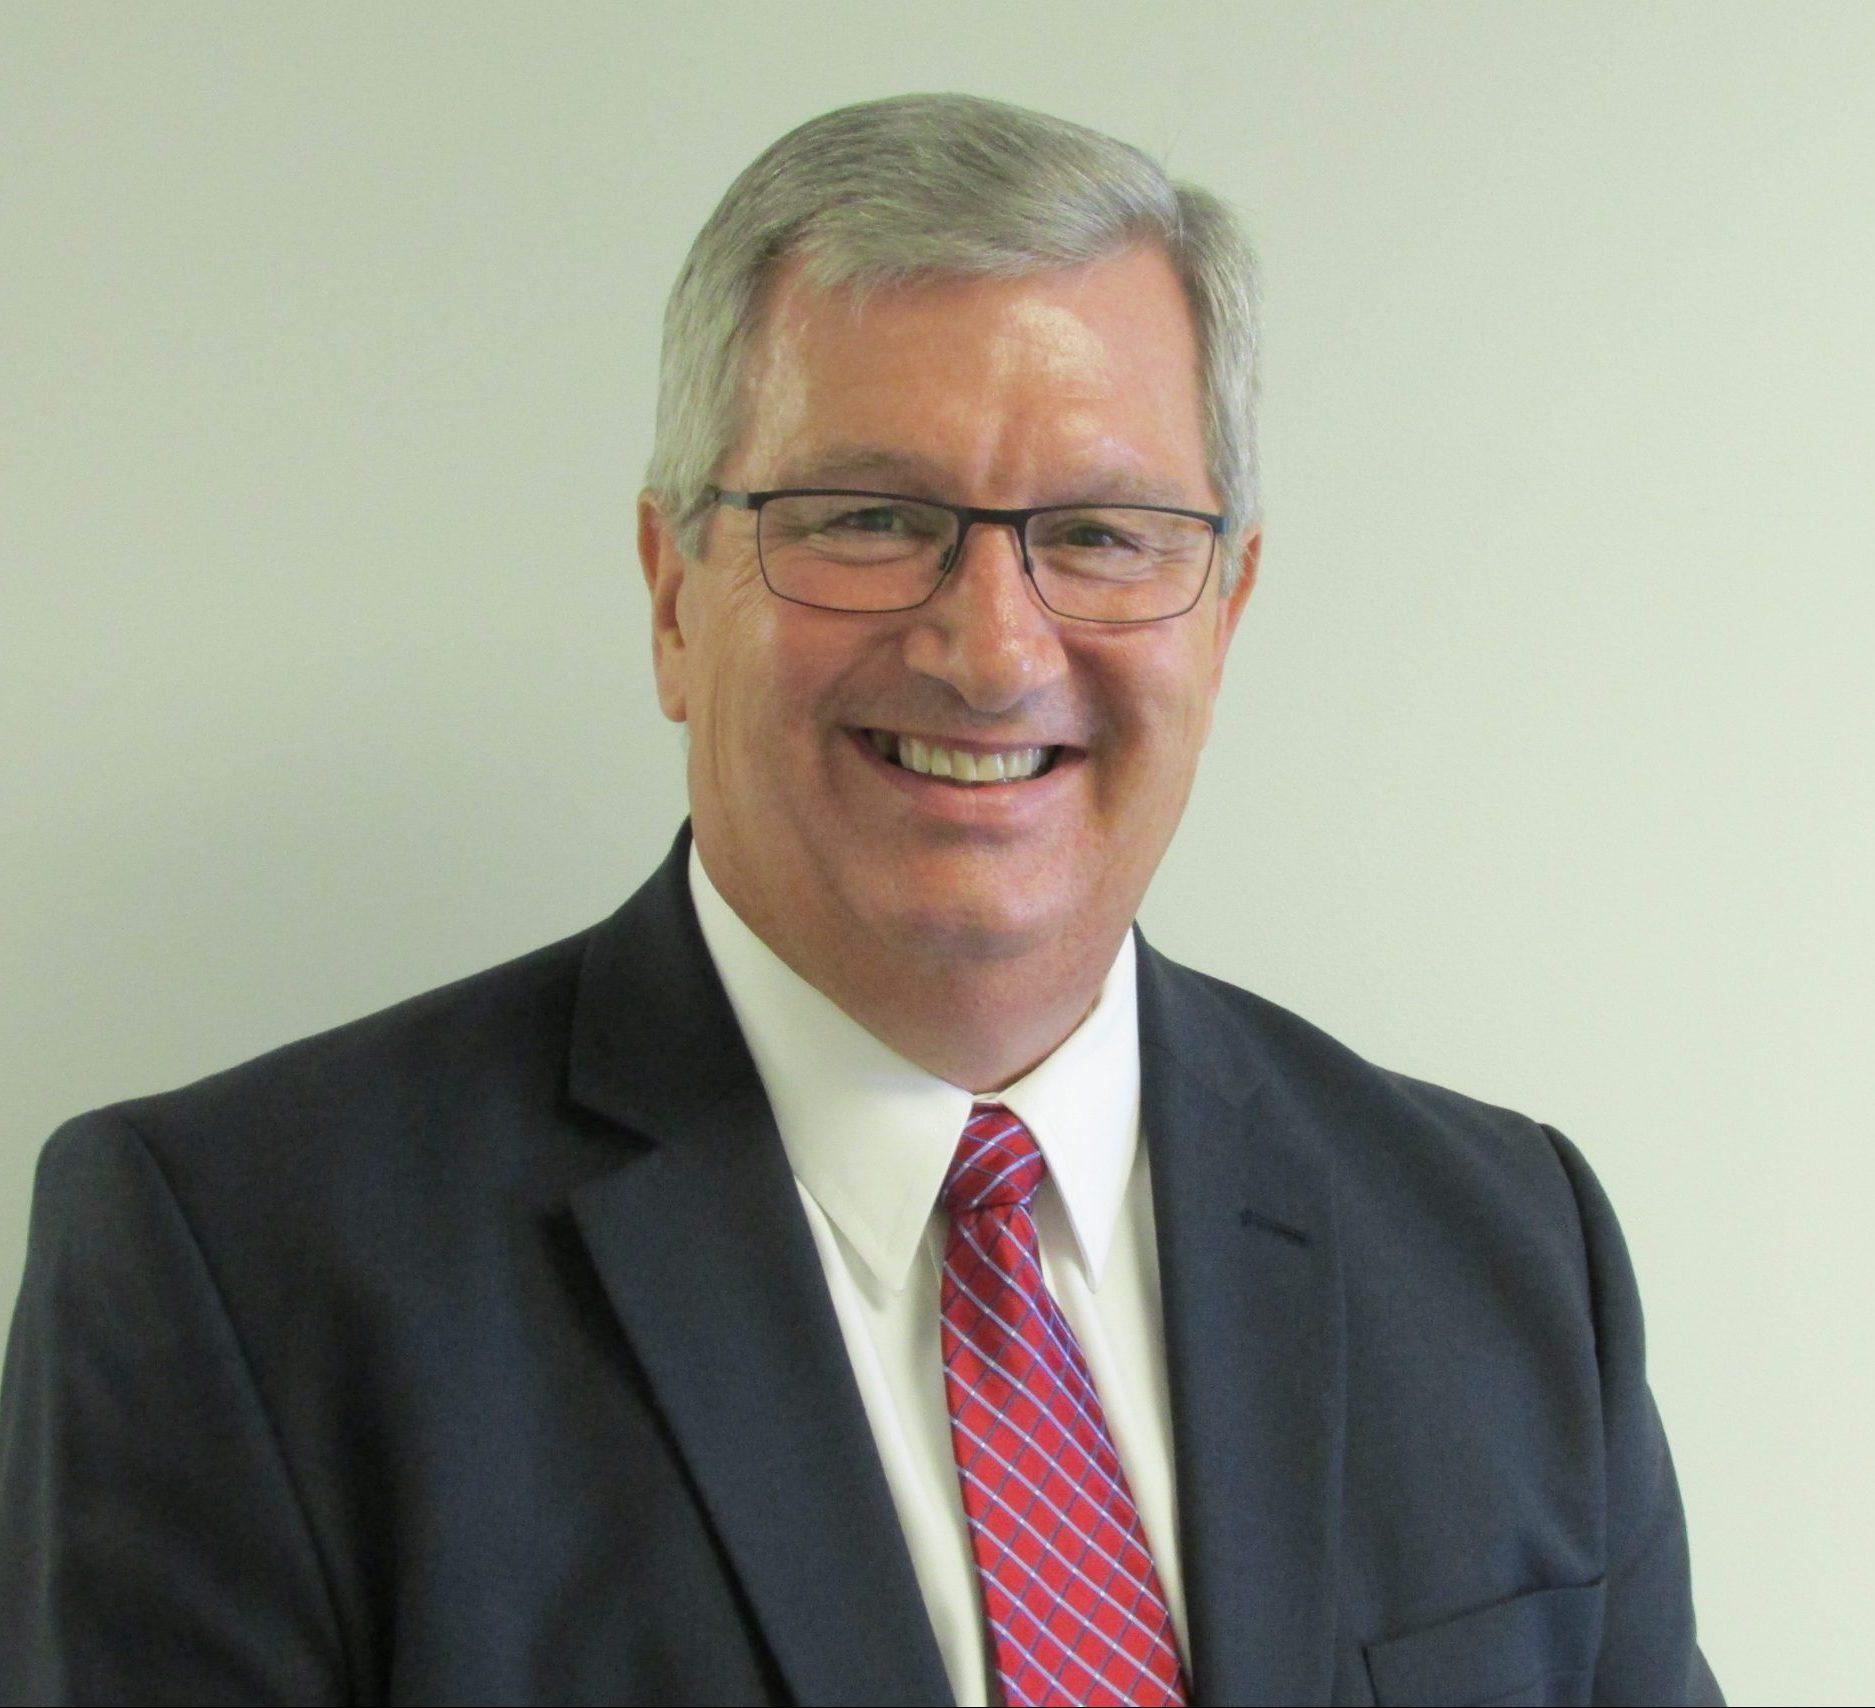 Keith Santee Regulatory Audit Supervisor at 1ST SUMMIT BANK